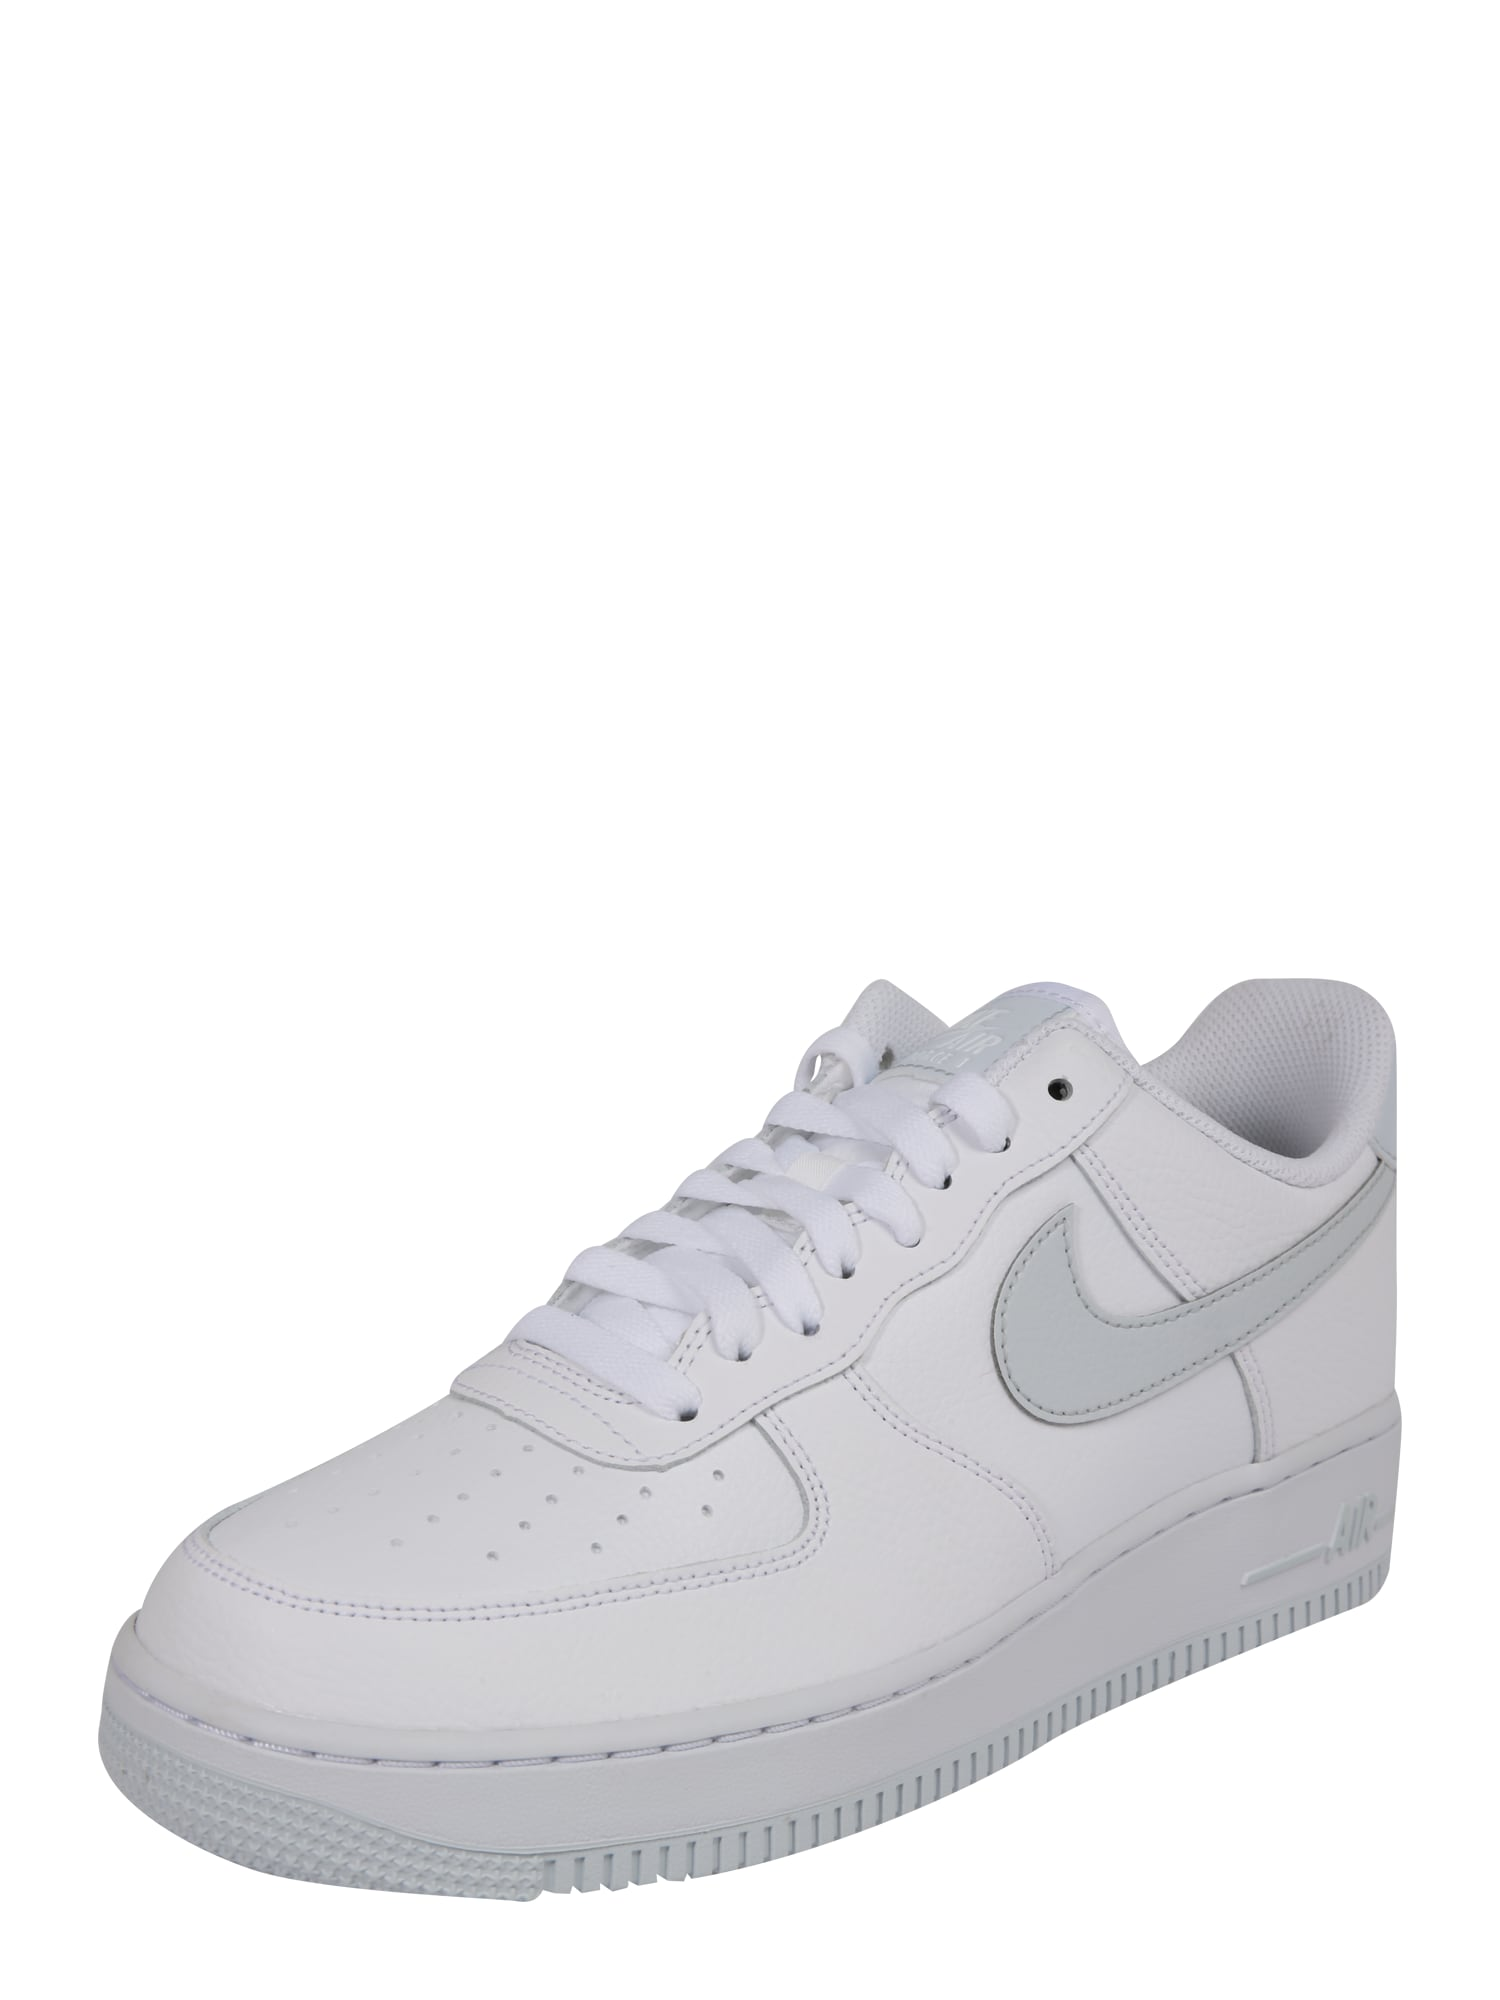 Tenisky AIR FORCE 1 07 SU19 bílá Nike Sportswear